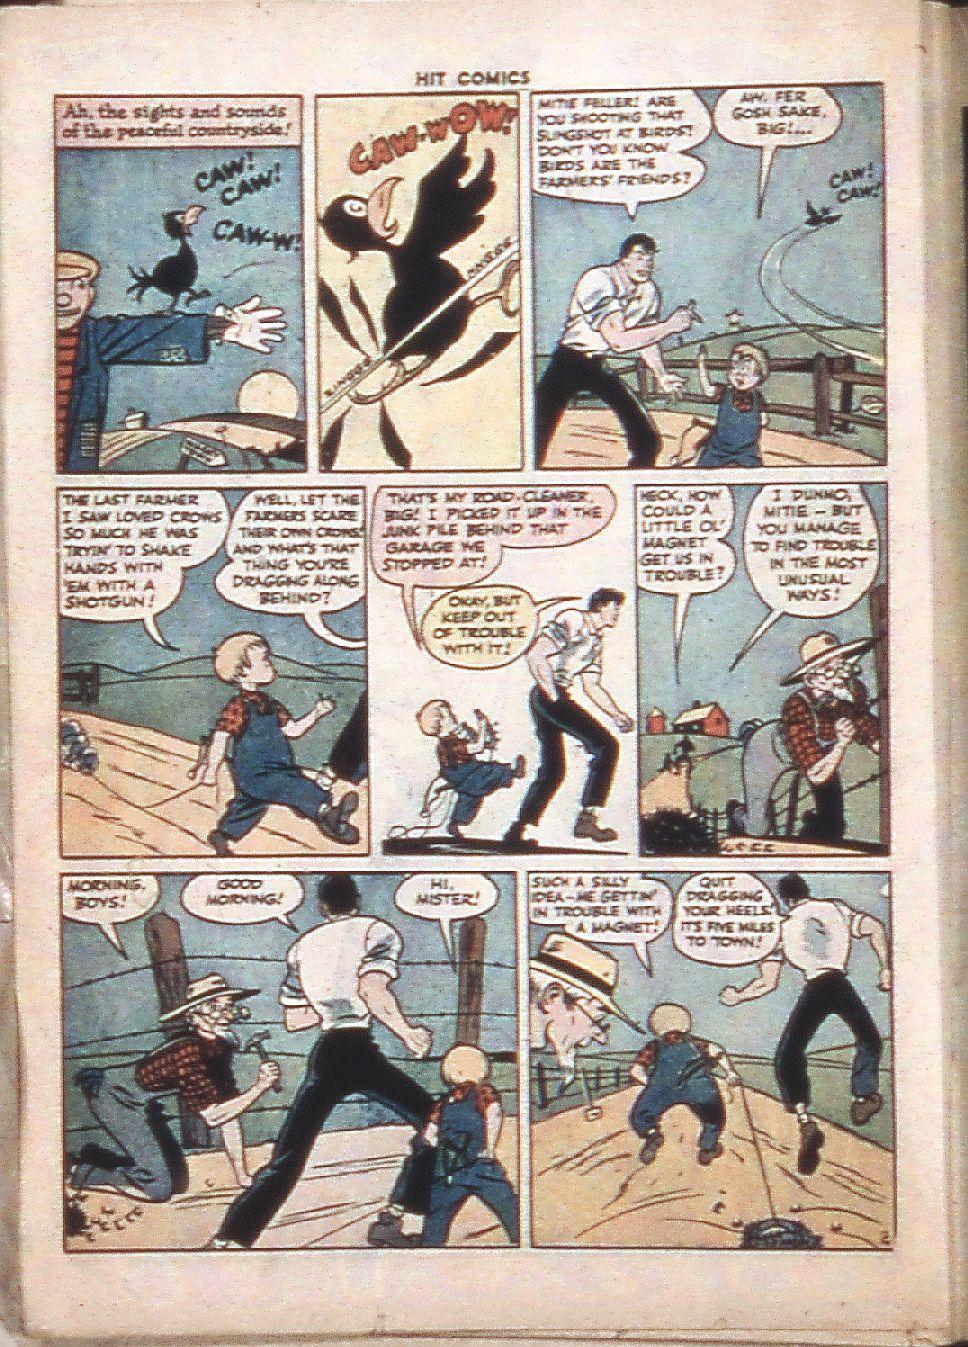 Read online Hit Comics comic -  Issue #37 - 32